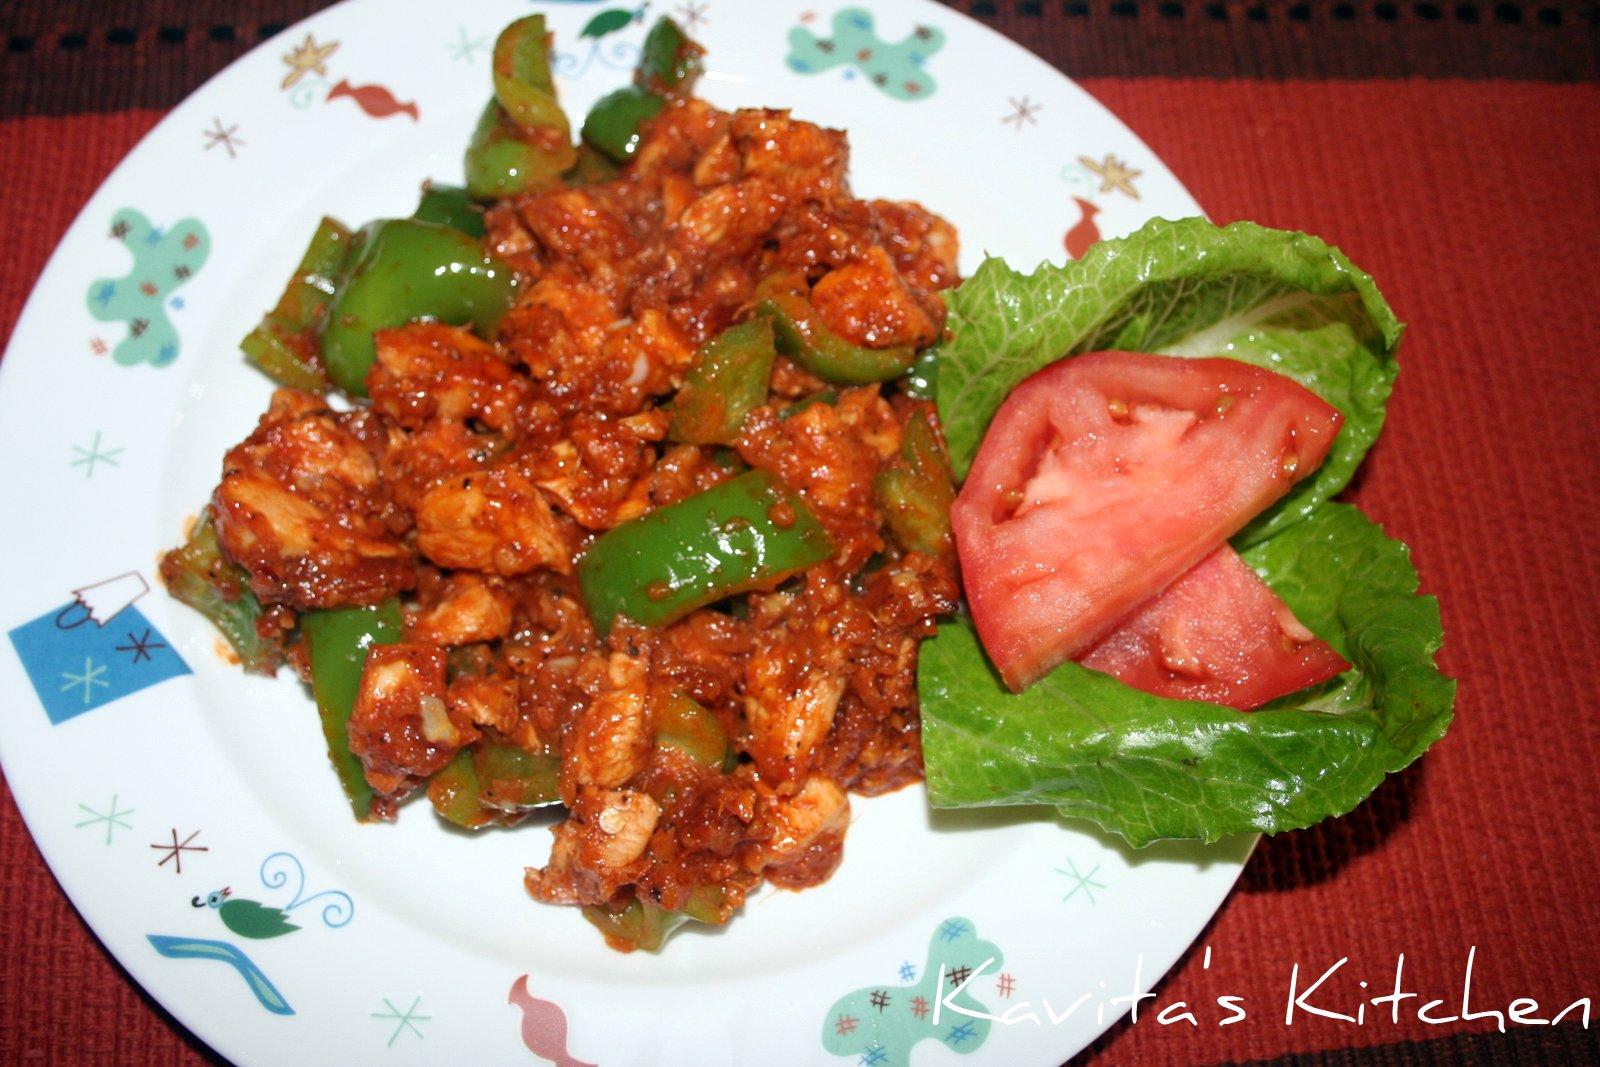 Chinese Food Stamford Ny